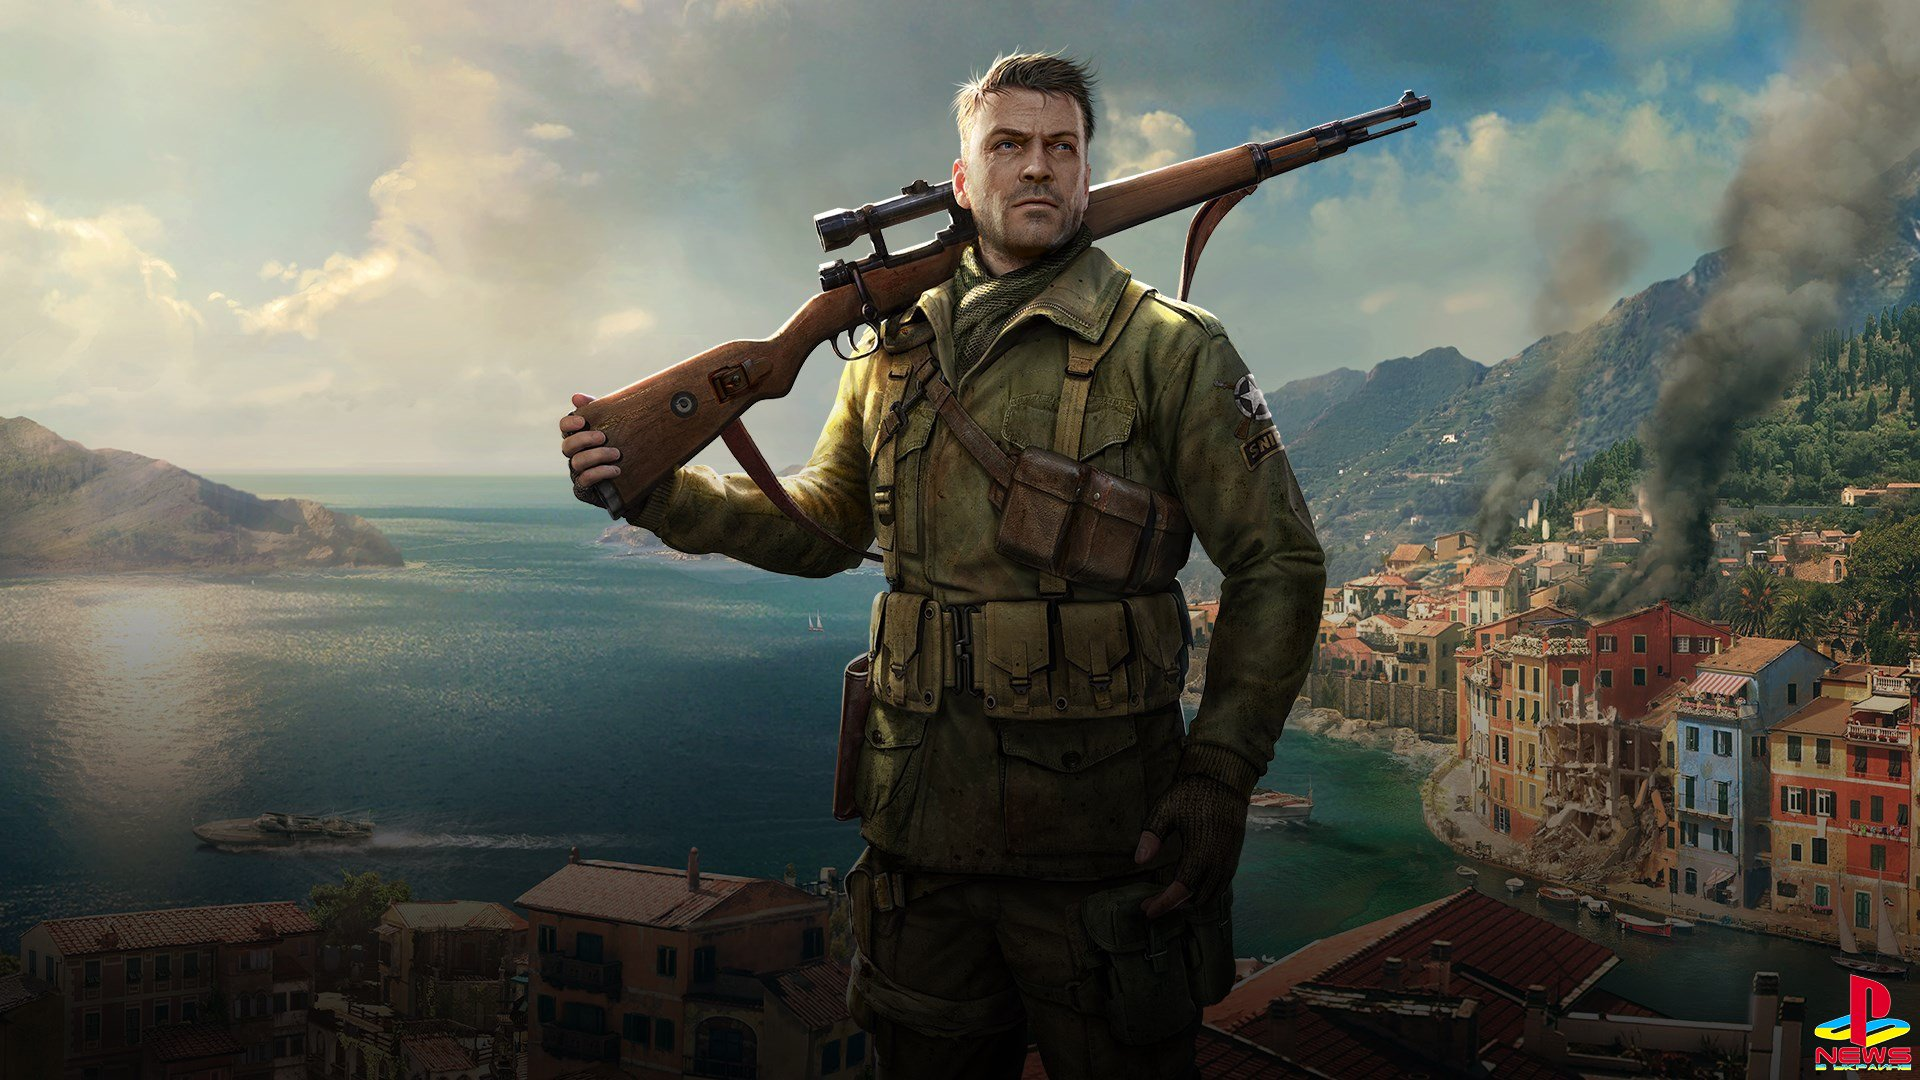 Анонсирован фильм по мотивам игр Sniper Elite